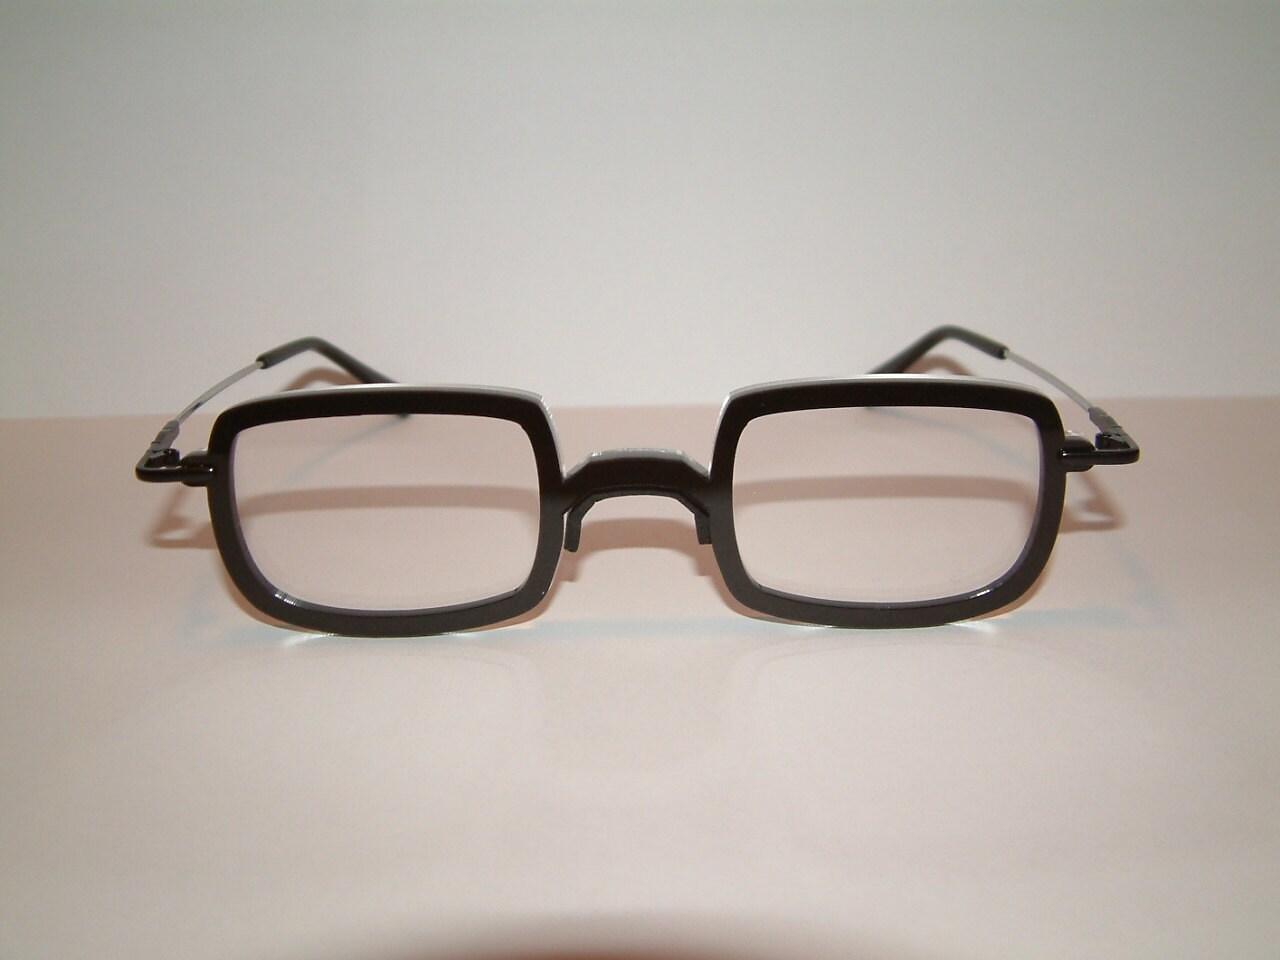 Anime black downward D frame cosplay costume glasses